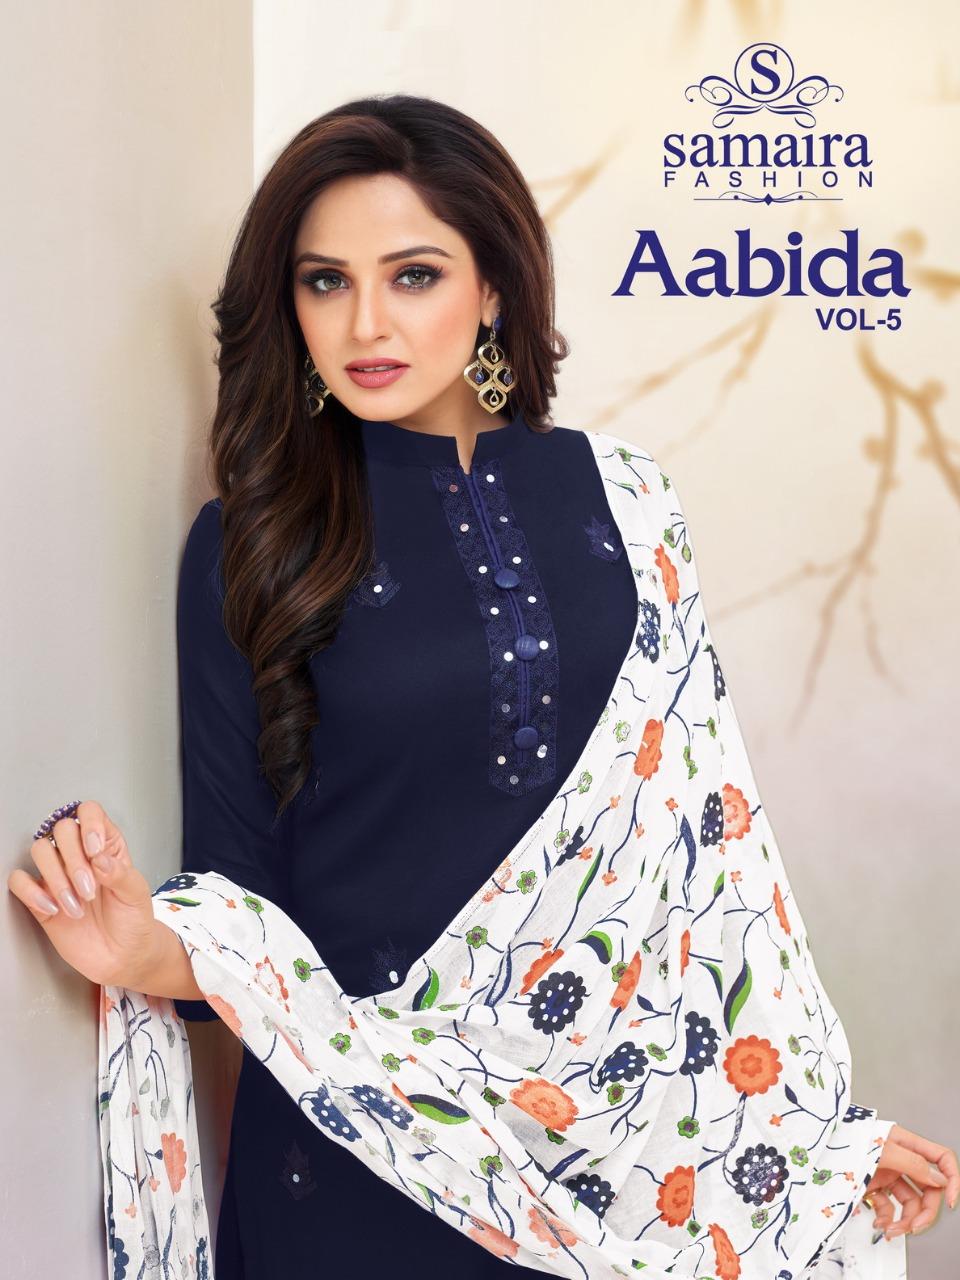 Samaira Fashion Aabida Vol 5 Designer Pure Cotton Jam Silk Suits In Best Wholesale Rate